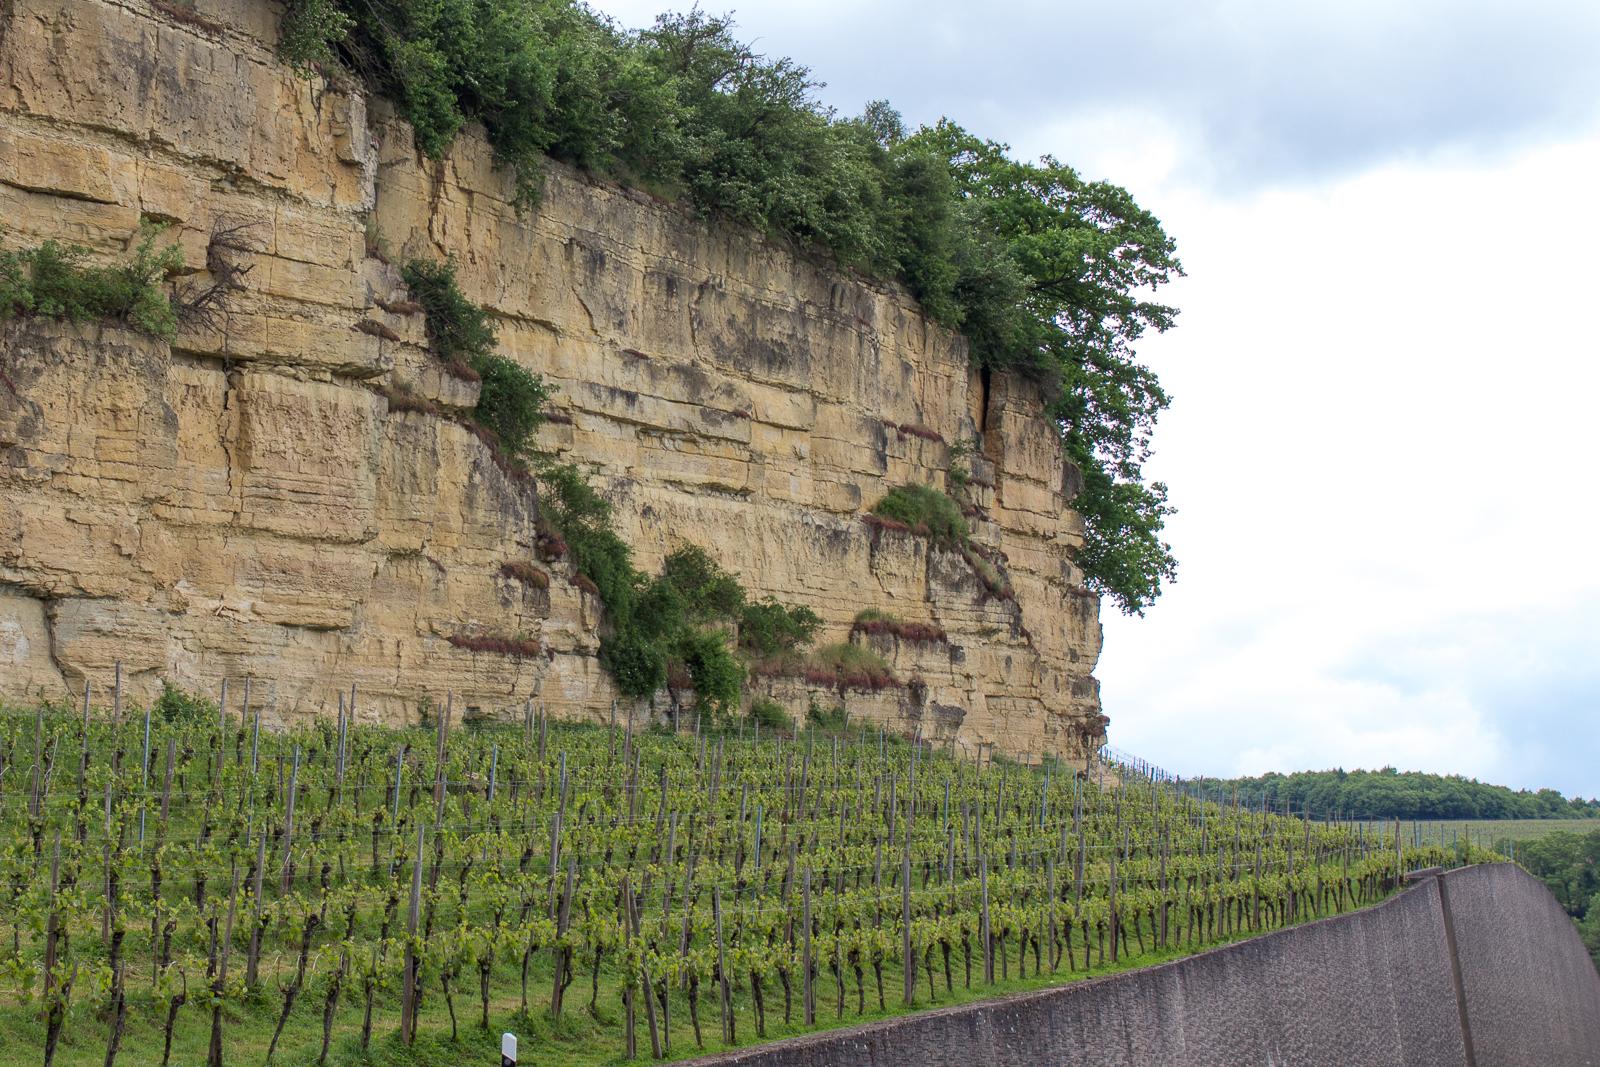 luxemburg_luxembourg_mosel_mediteraner_garten-4845